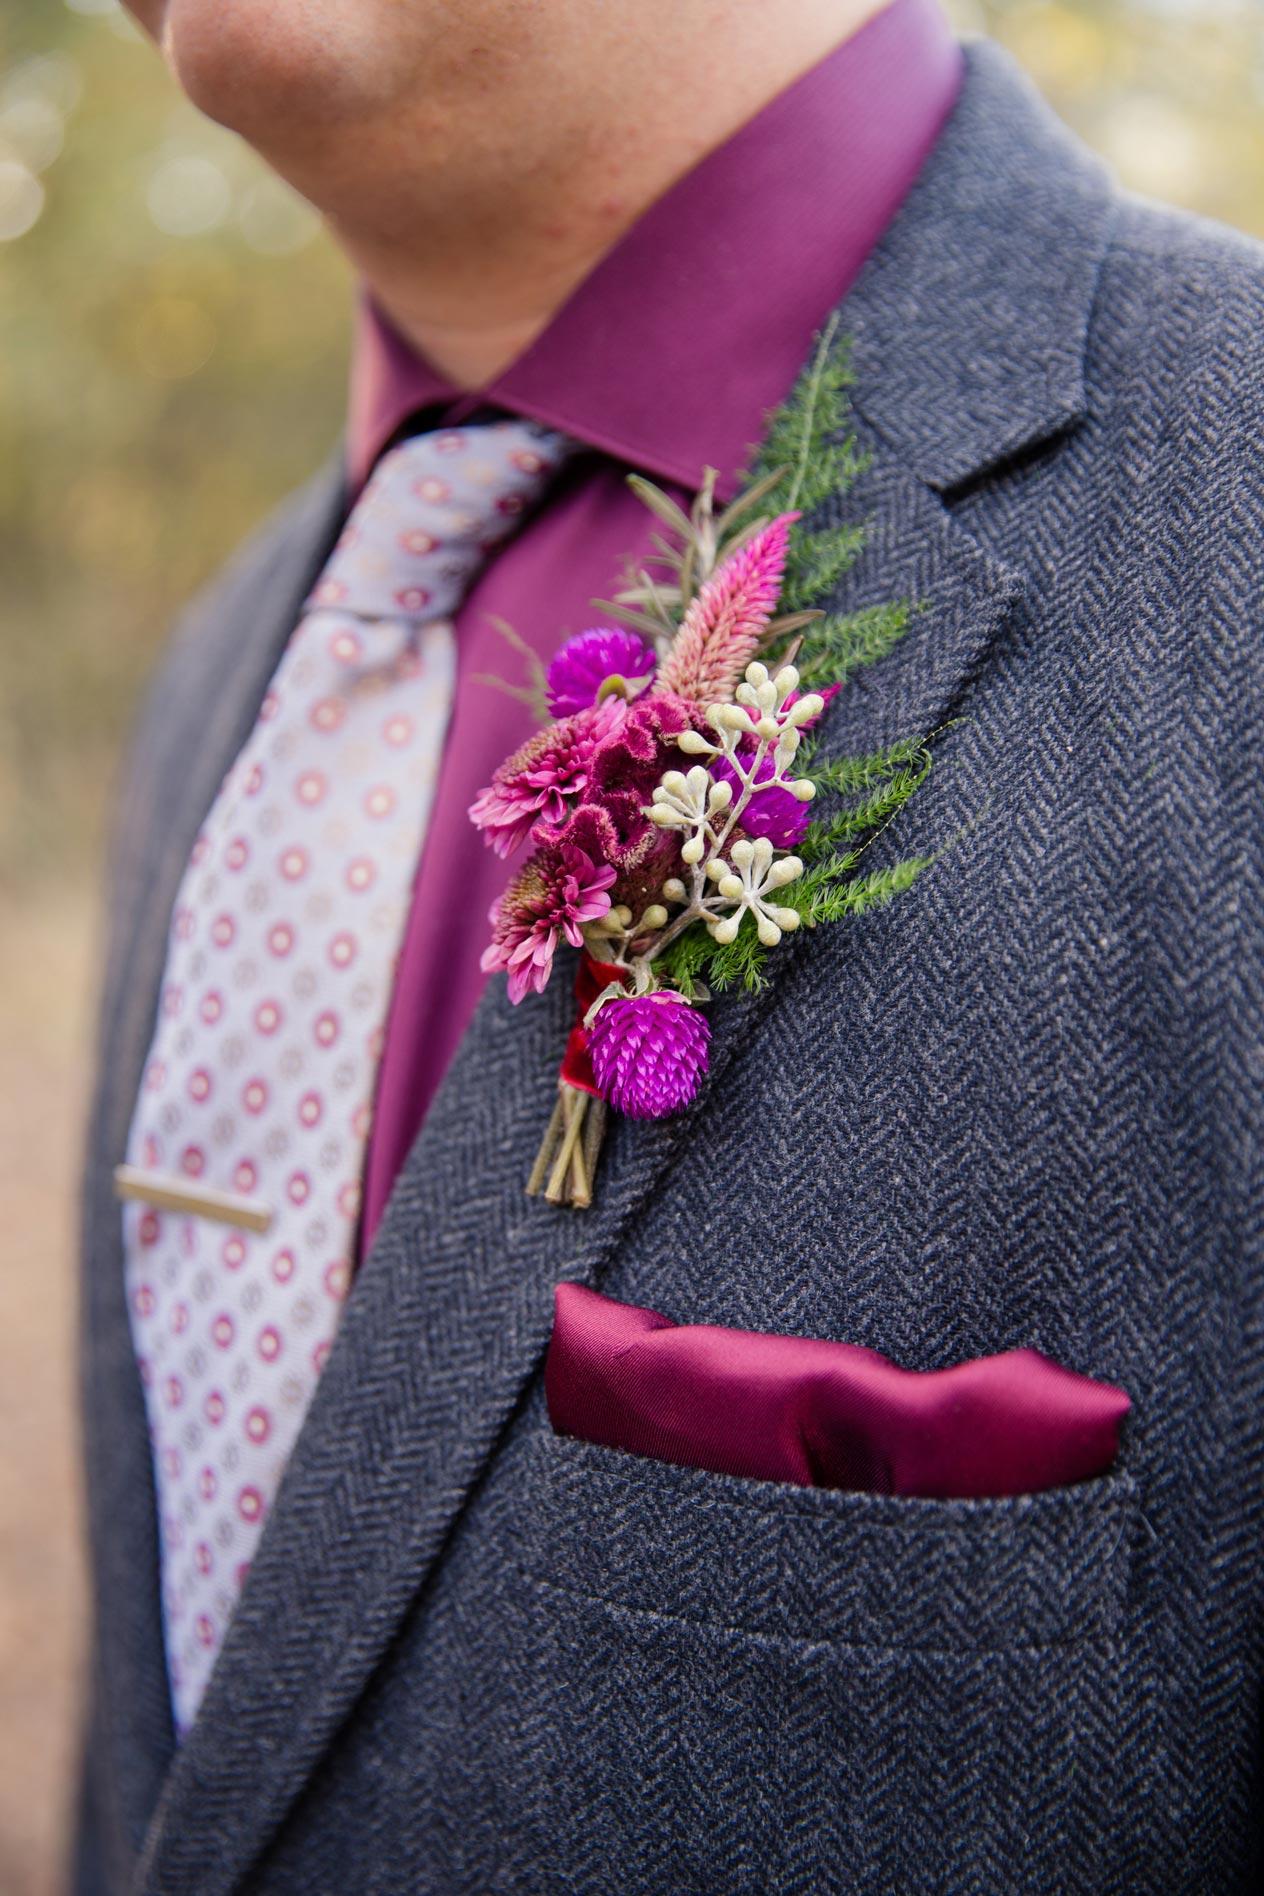 Rustic-Whimsical-Wedding- Tulsa-Wedding-FloristRobyns-Flower-Garden_Mallory-Hall-Photography07.jpg